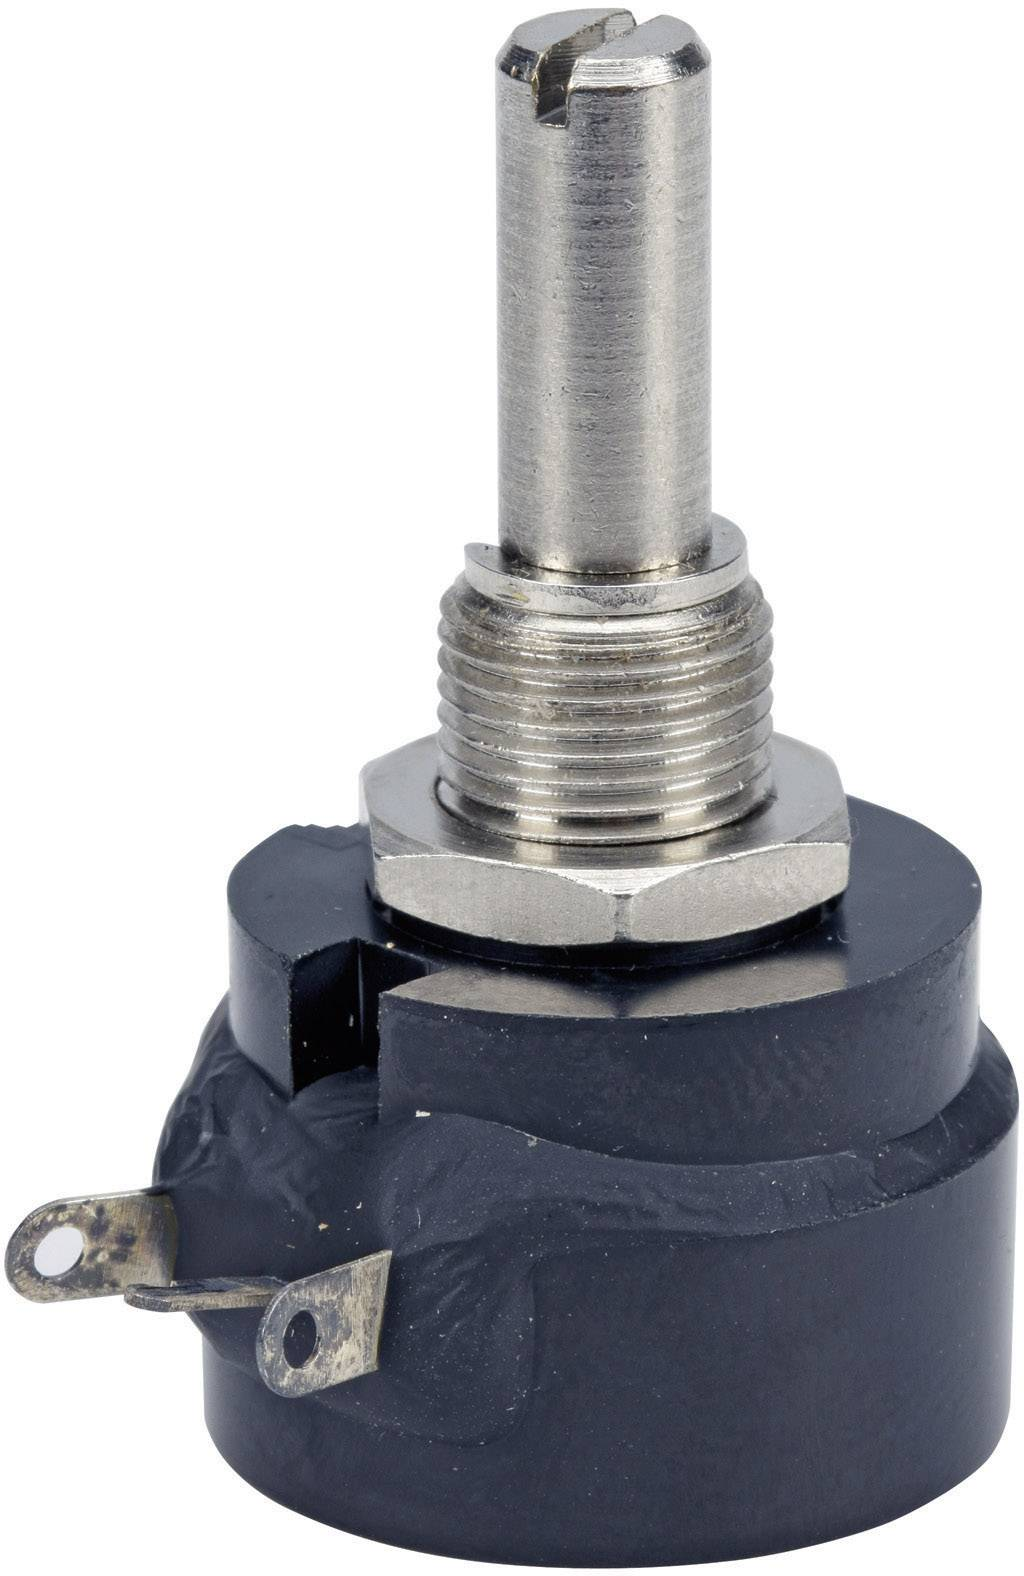 Drôtový potenciometer mono TT Electronics AB 3101206105 3101206105, 0.5 W, 50 Ohm, 1 ks